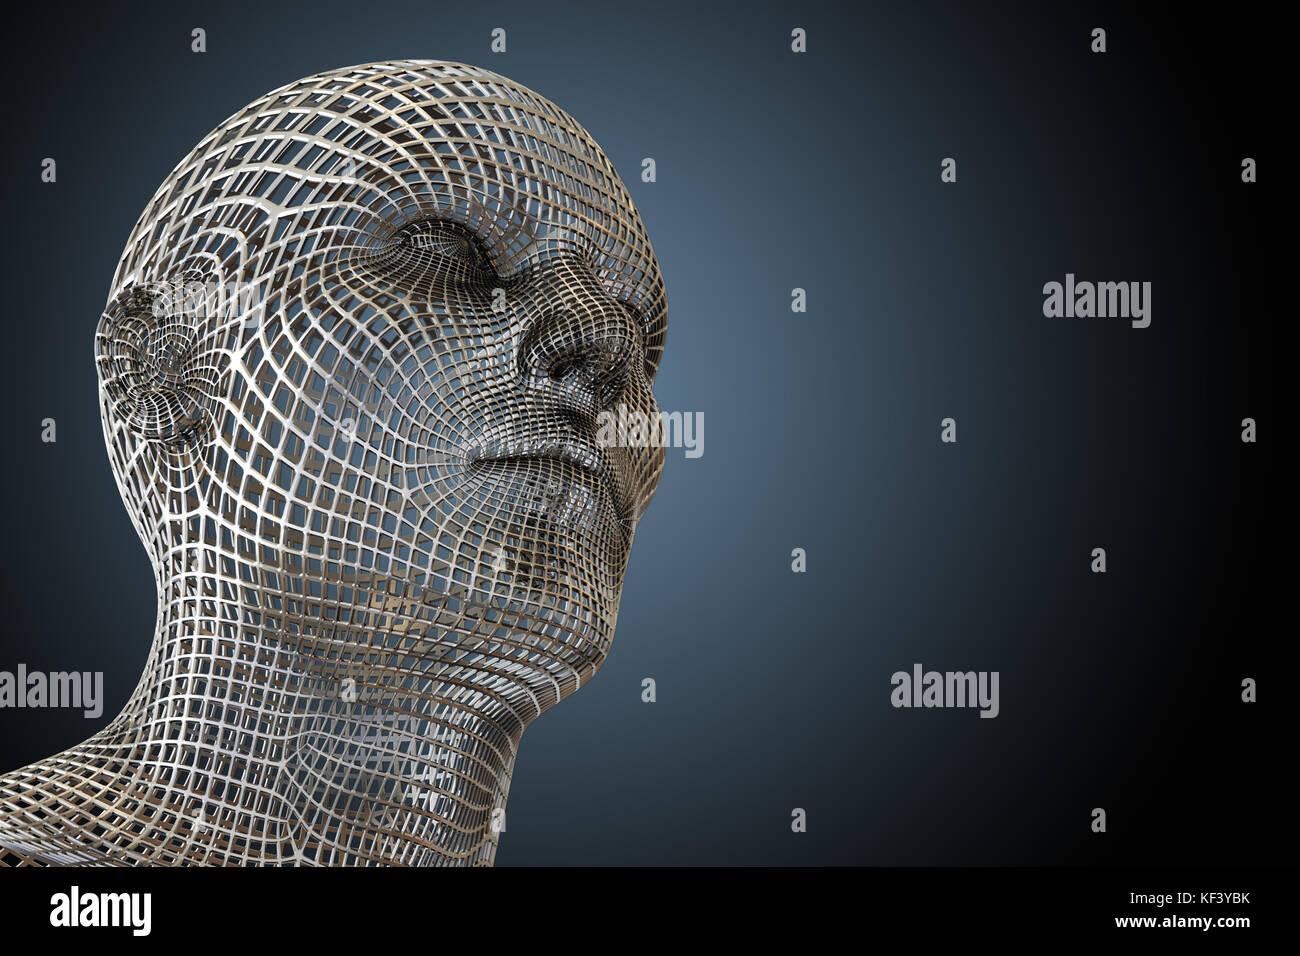 Wire Frame Face Stockfotos & Wire Frame Face Bilder - Seite 2 - Alamy